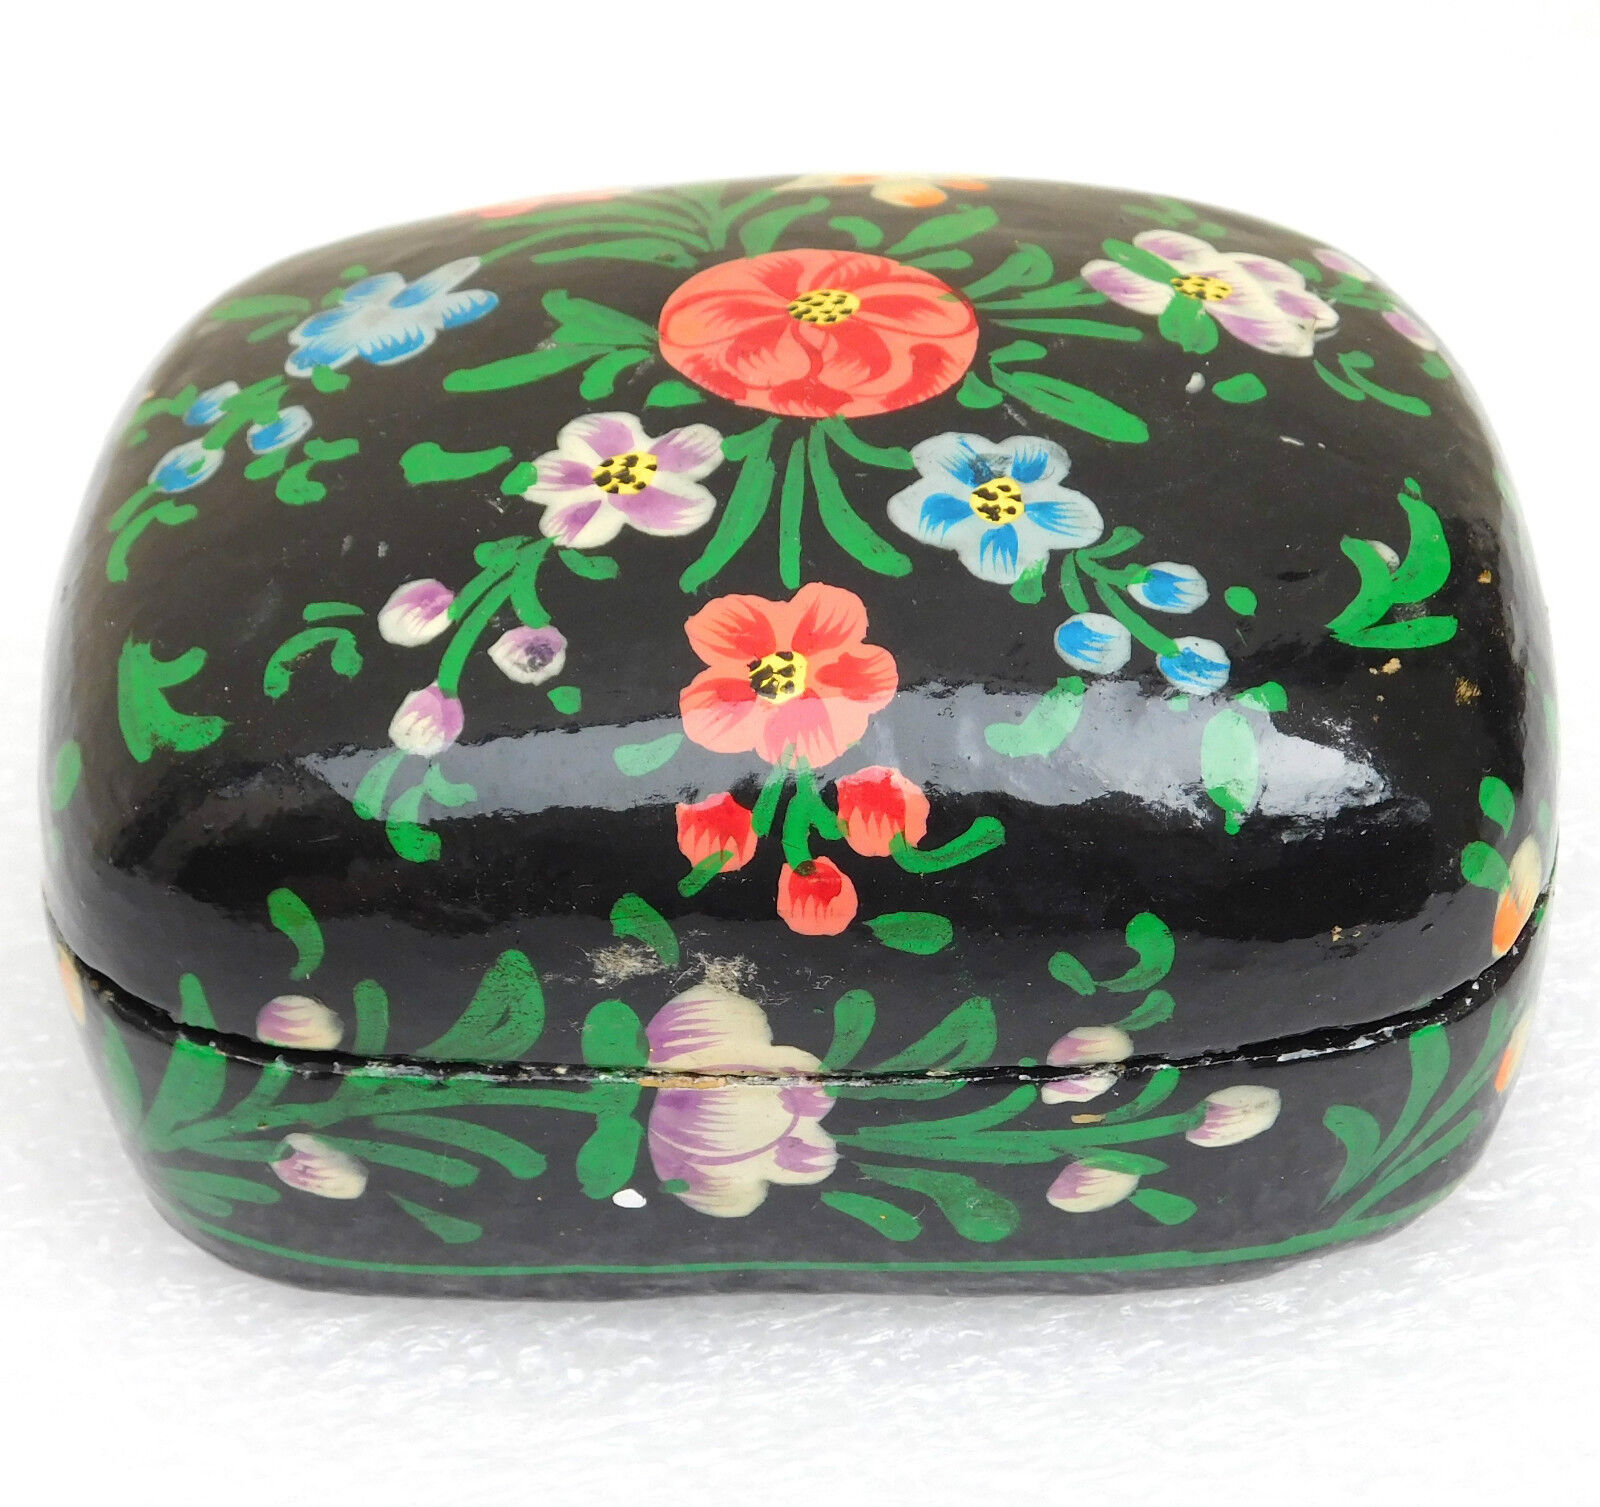 Papier mache trinket box Lacquer tea caddy box Flower pattern Kashmir India